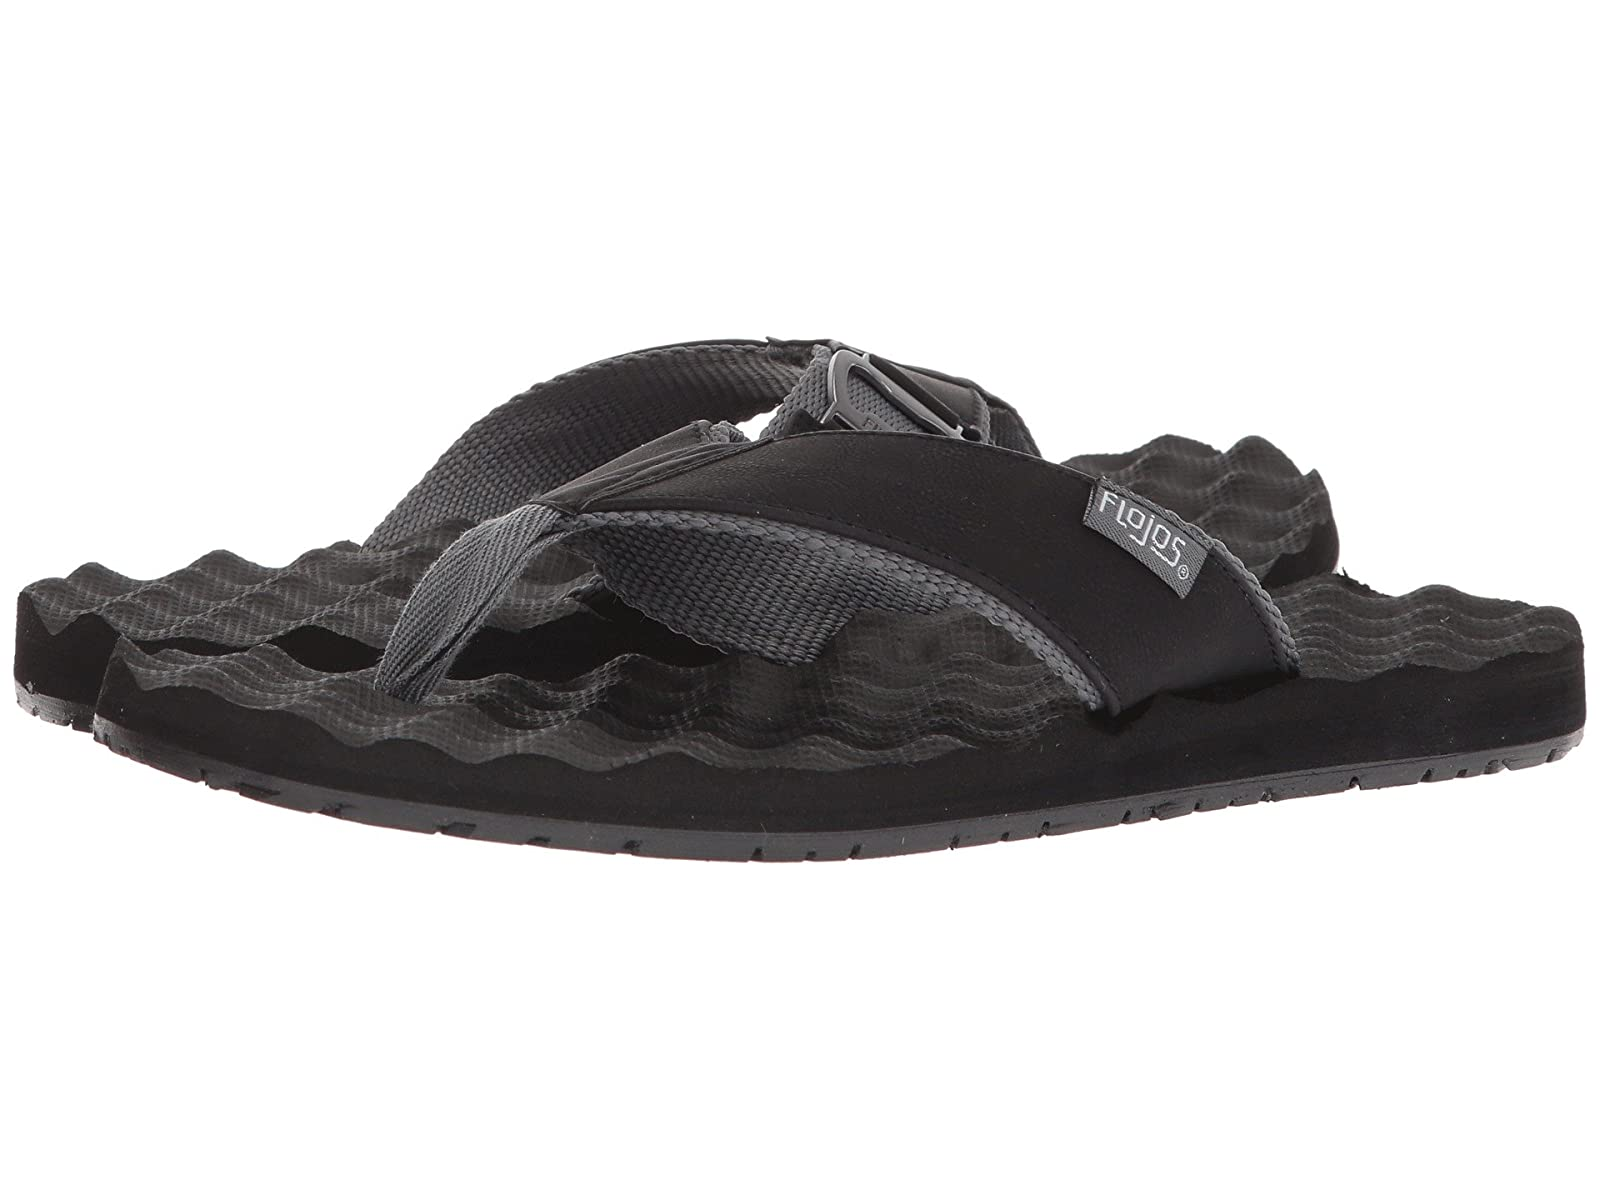 Flojos EstilerAtmospheric grades have affordable shoes